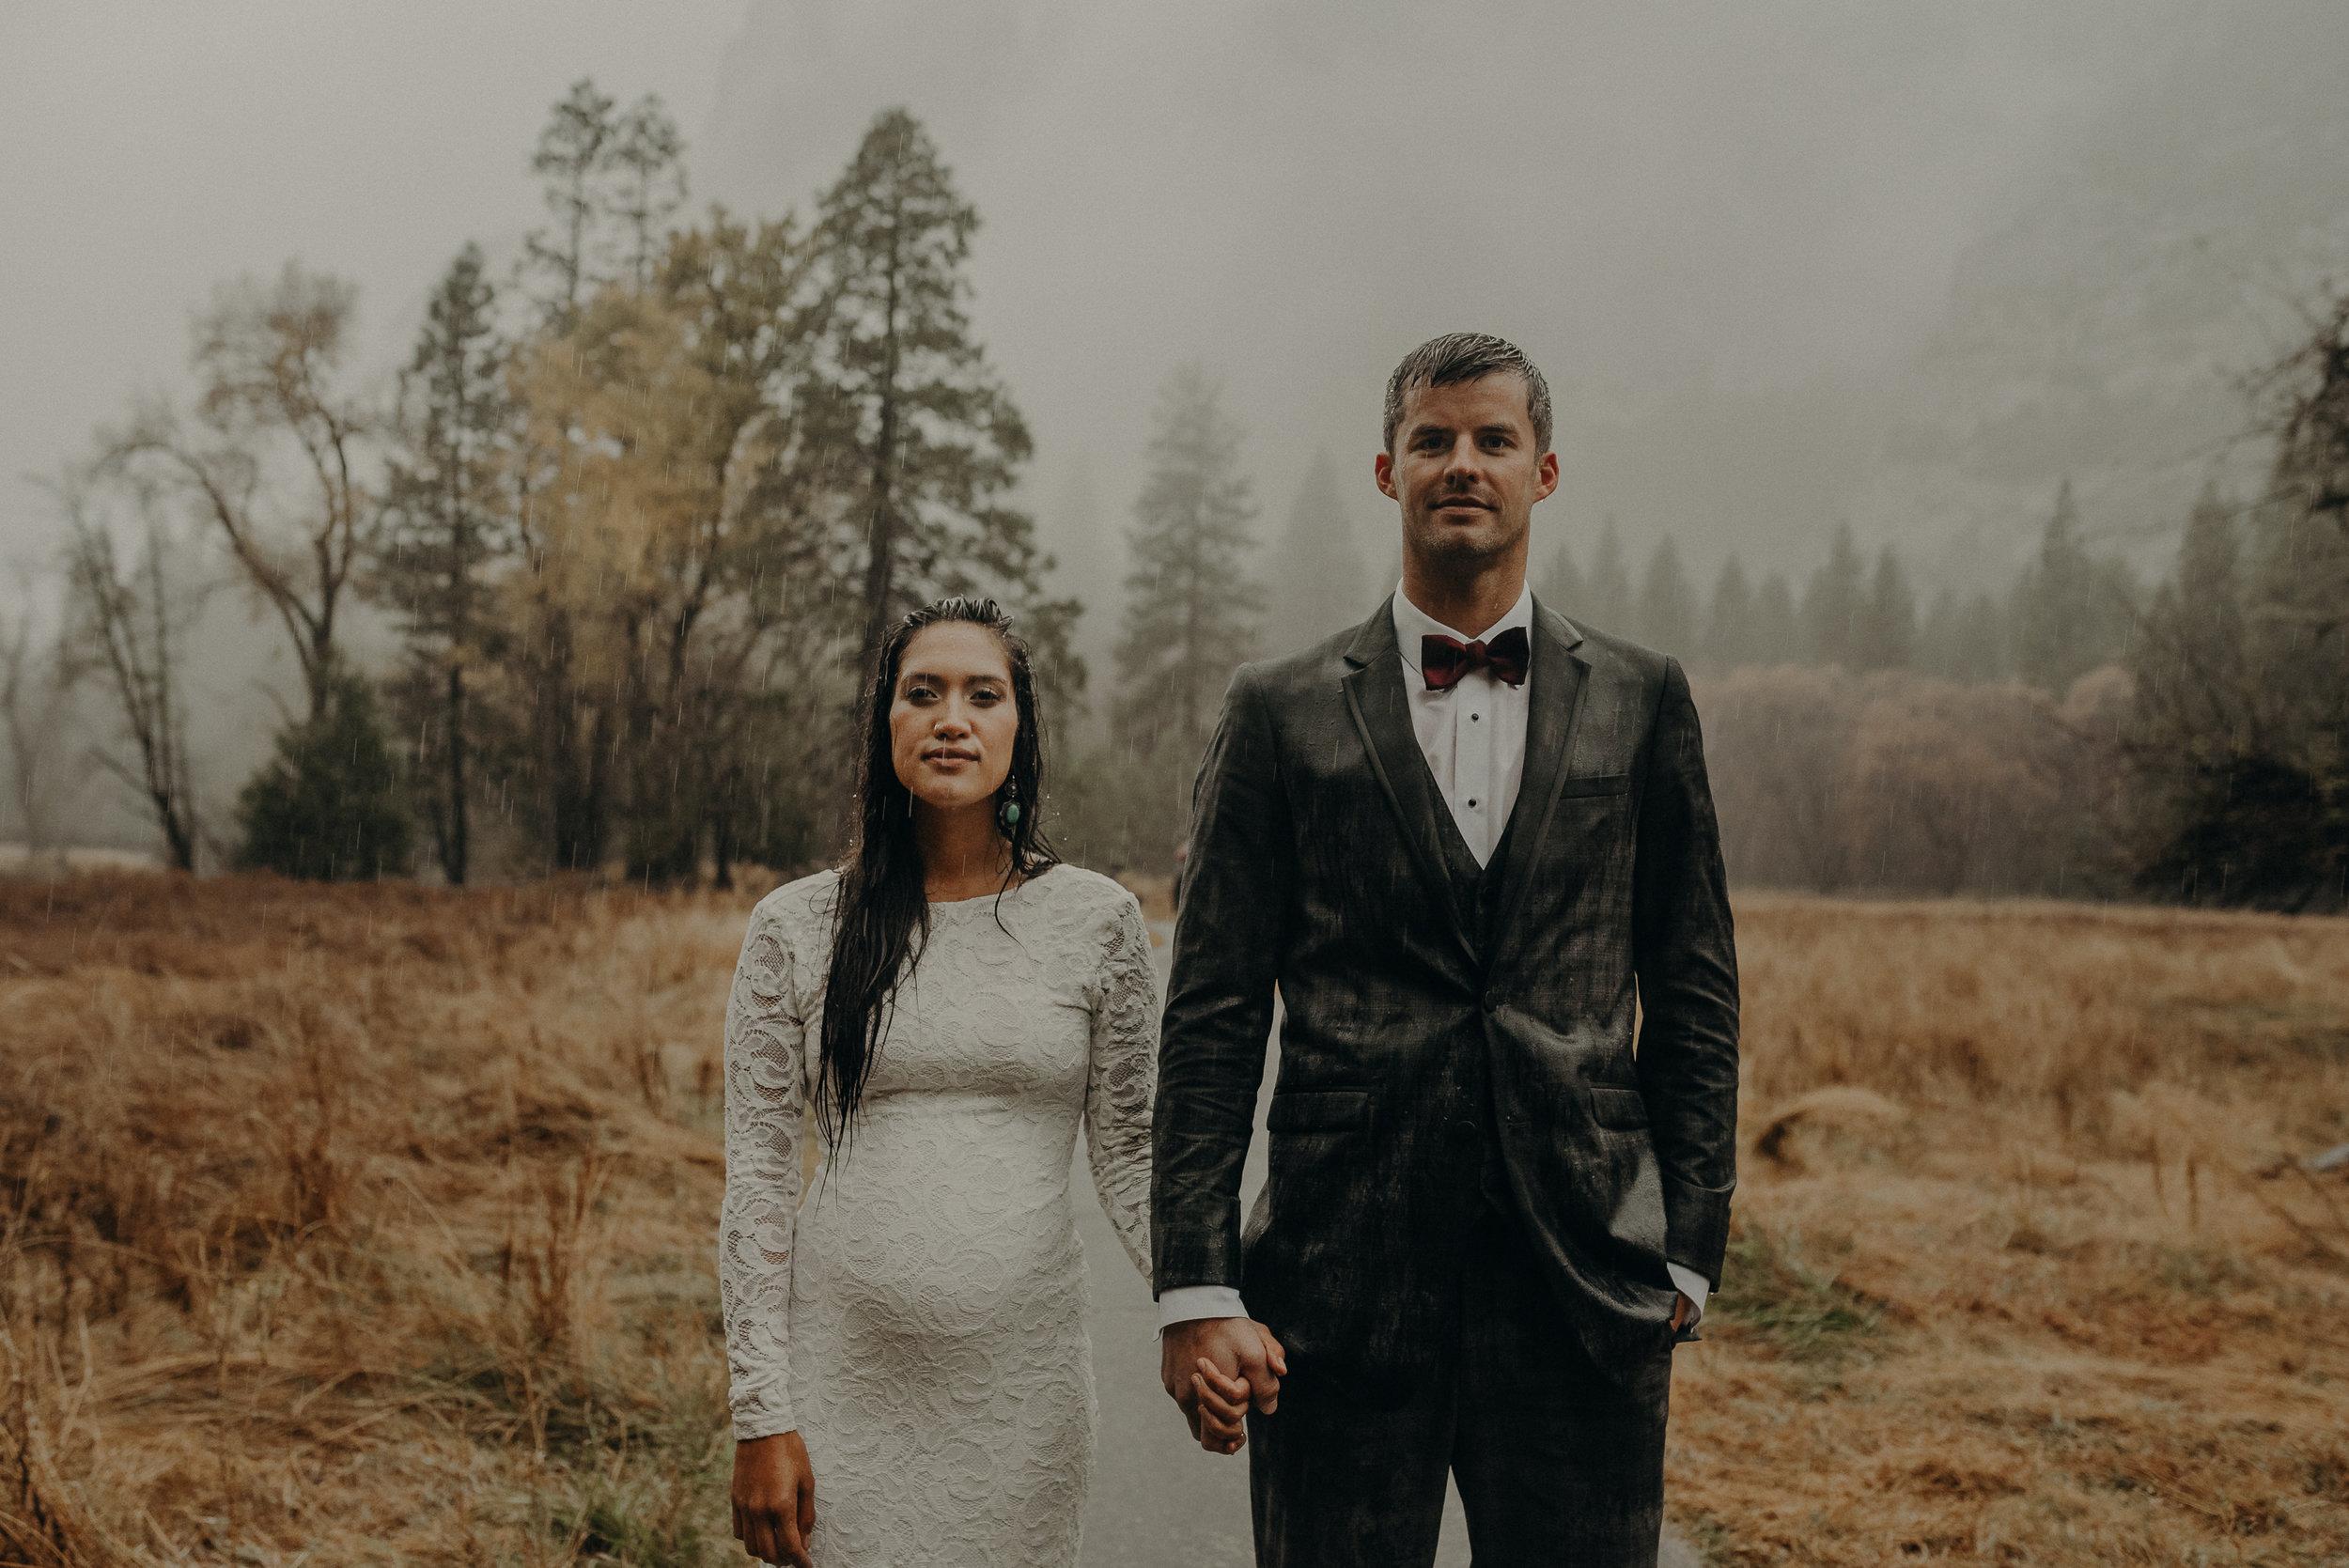 Isaiah + Taylor Photography - Yosemite Elopement - Los Angeles Wedding Photographer-79.jpg